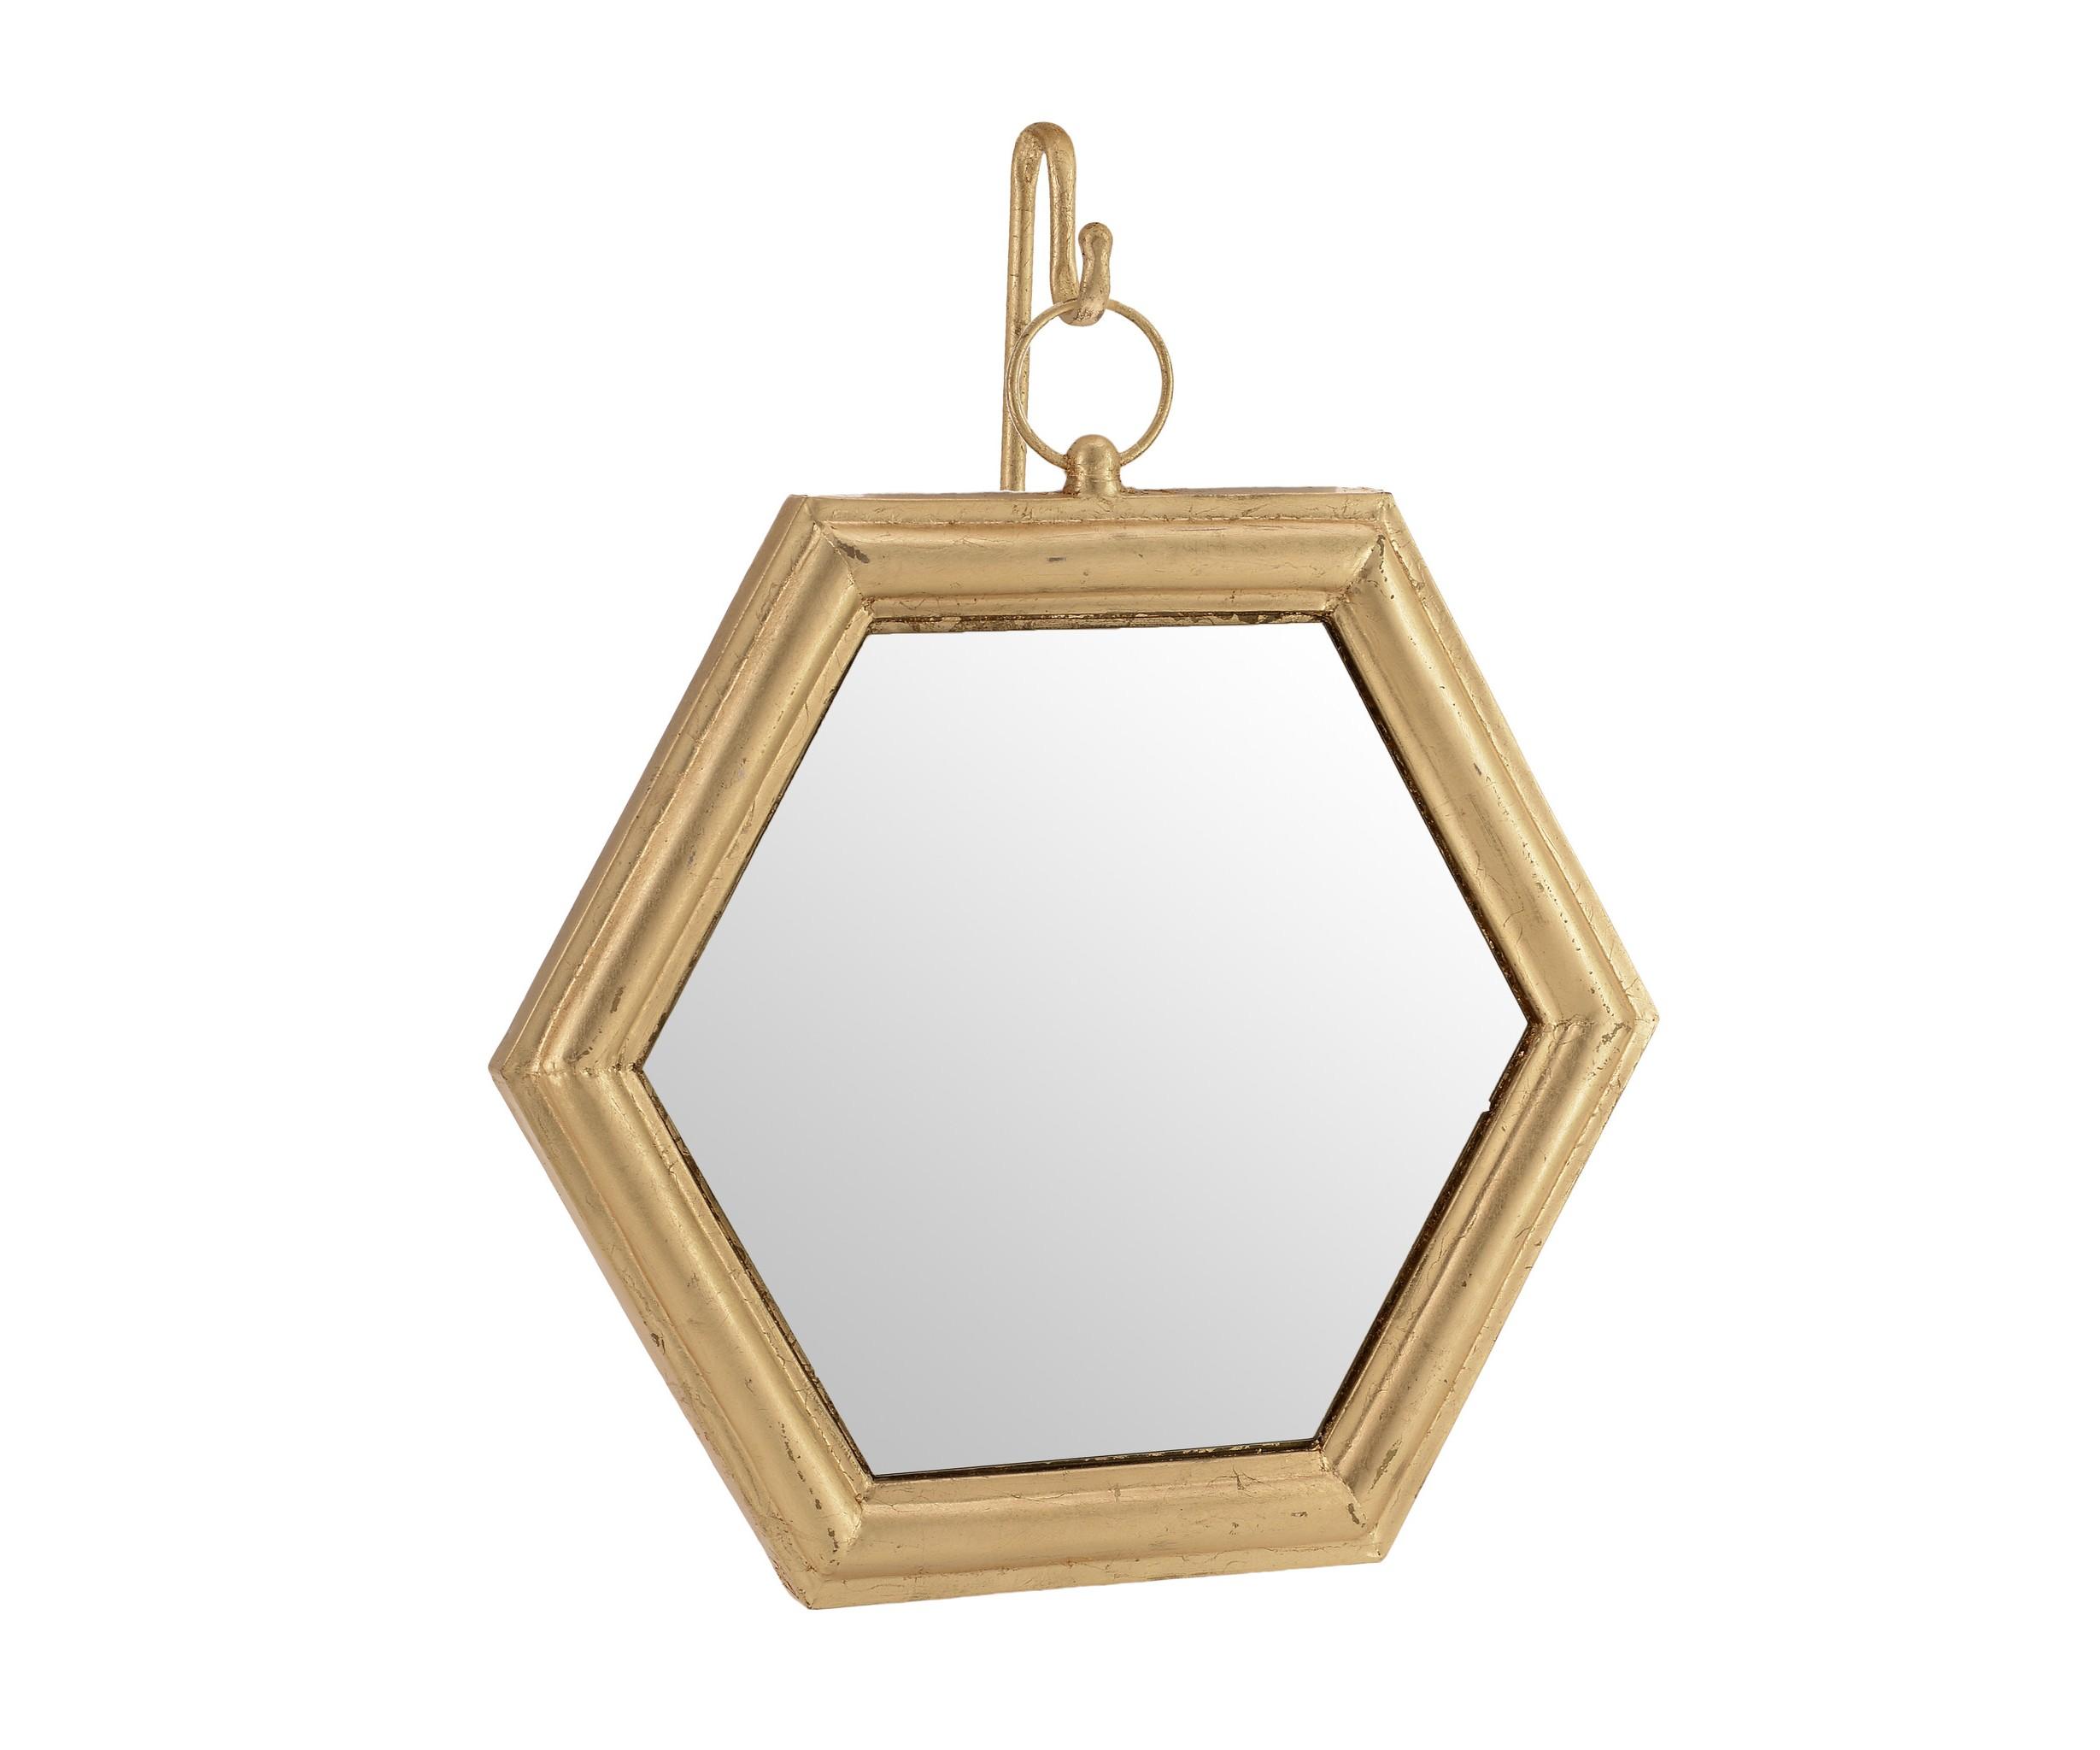 Зеркало TatianaНастенные зеркала<br><br><br>Material: Металл<br>Ширина см: 50<br>Высота см: 51<br>Глубина см: 3